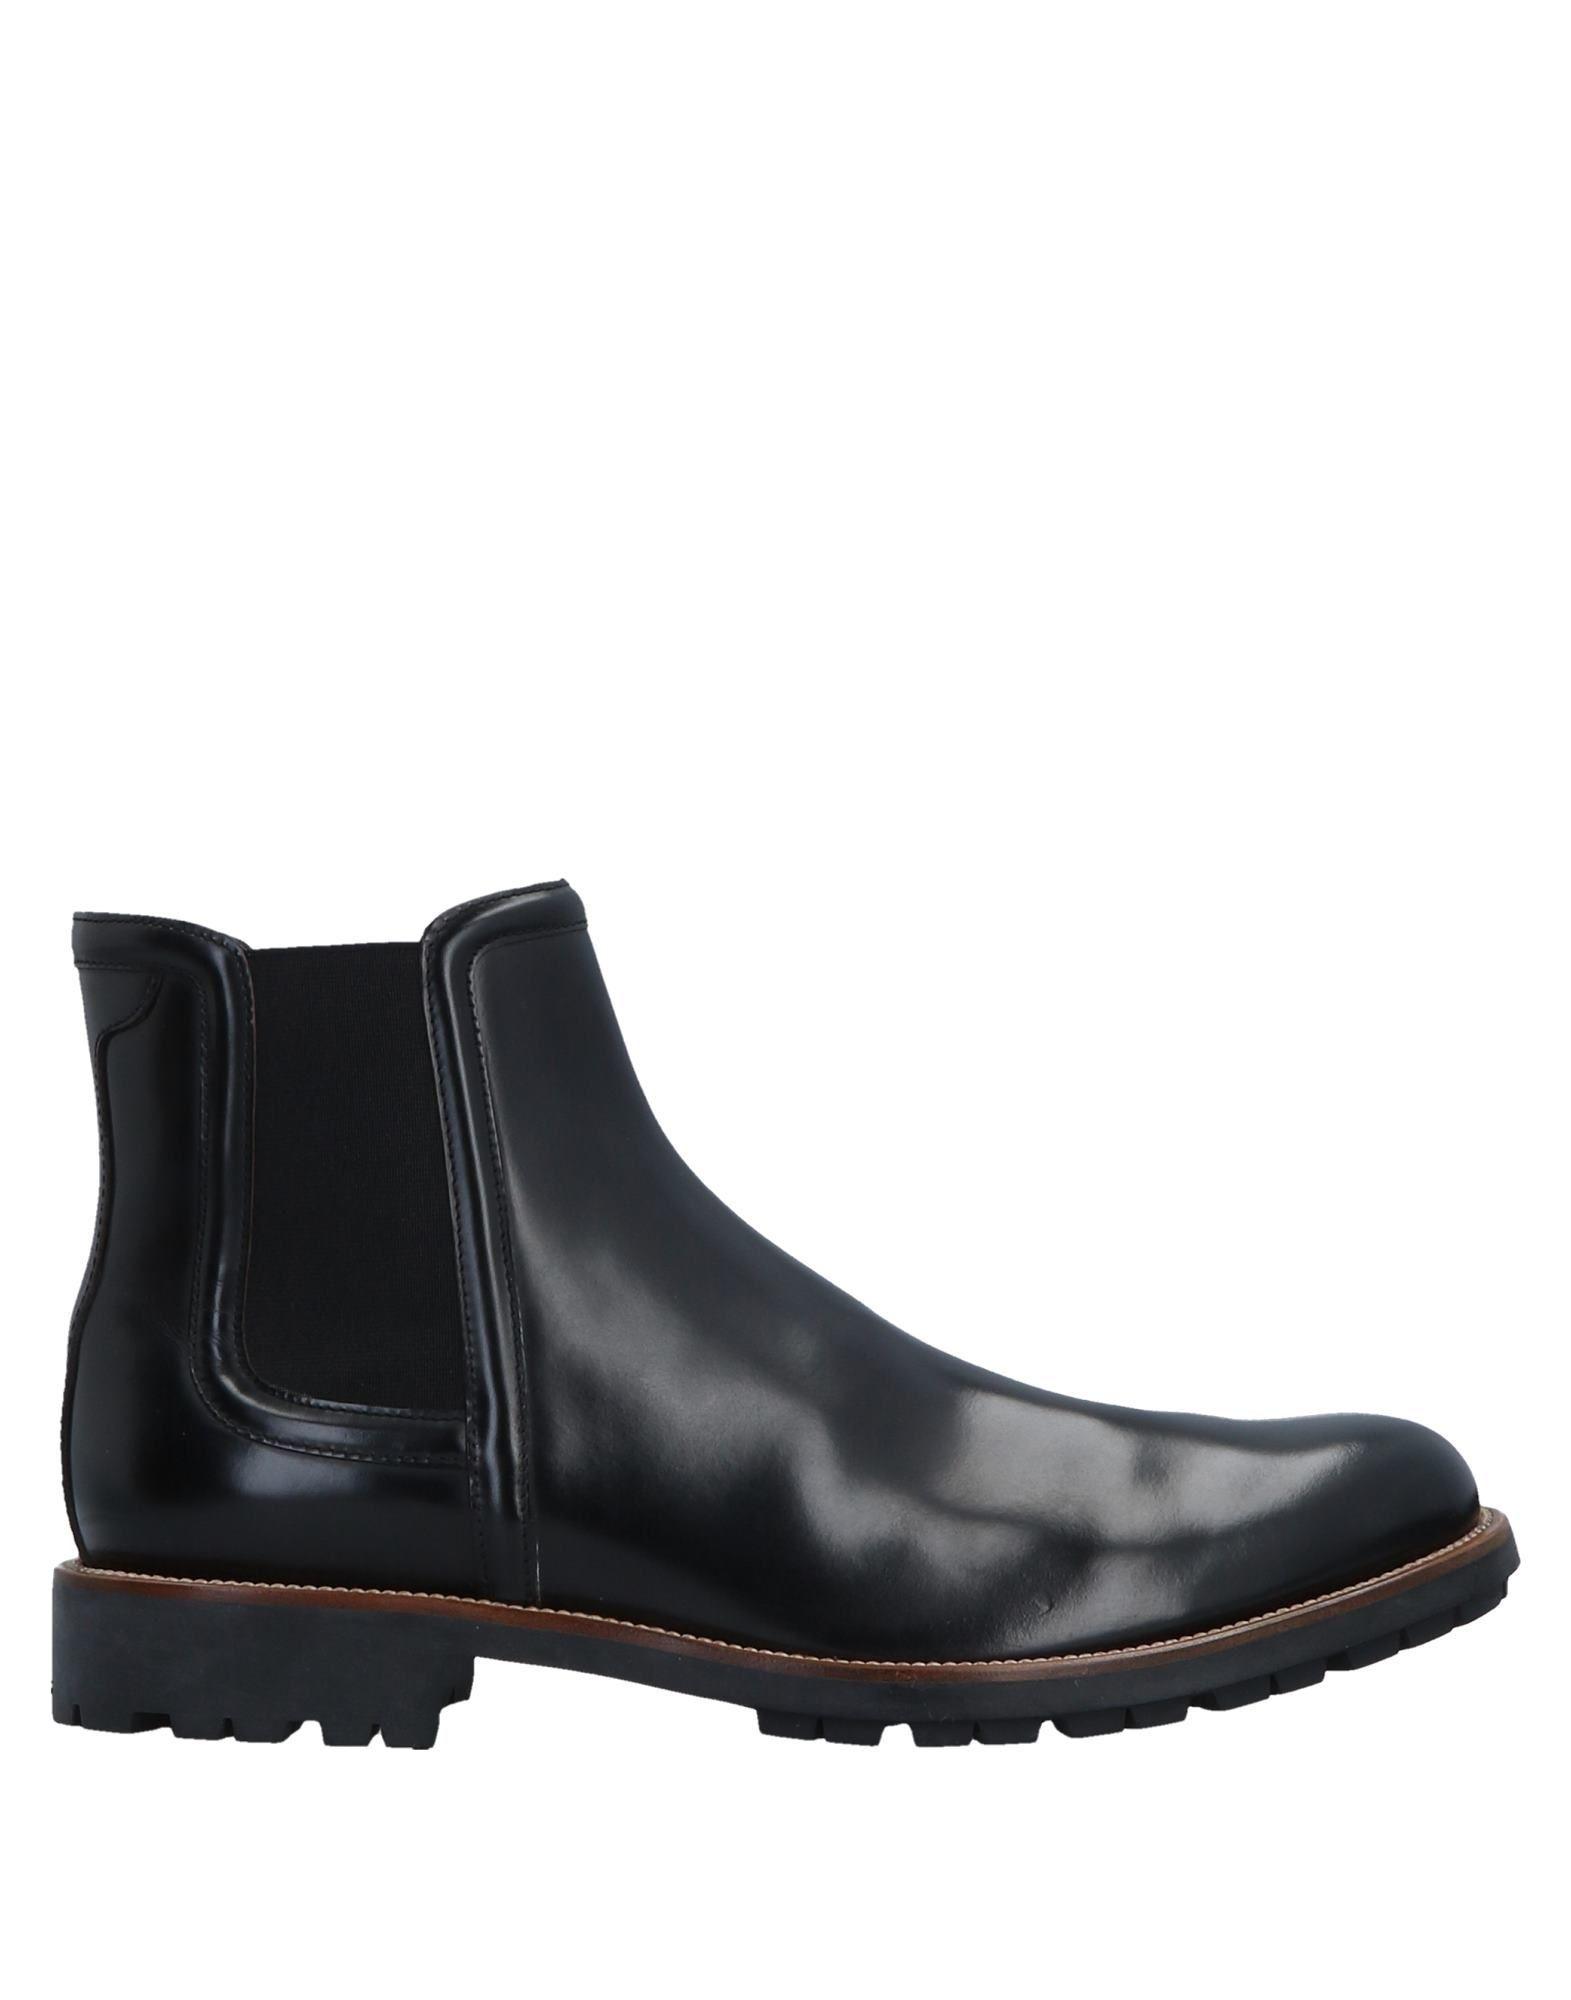 Hogan Black Leather Ankle Boots